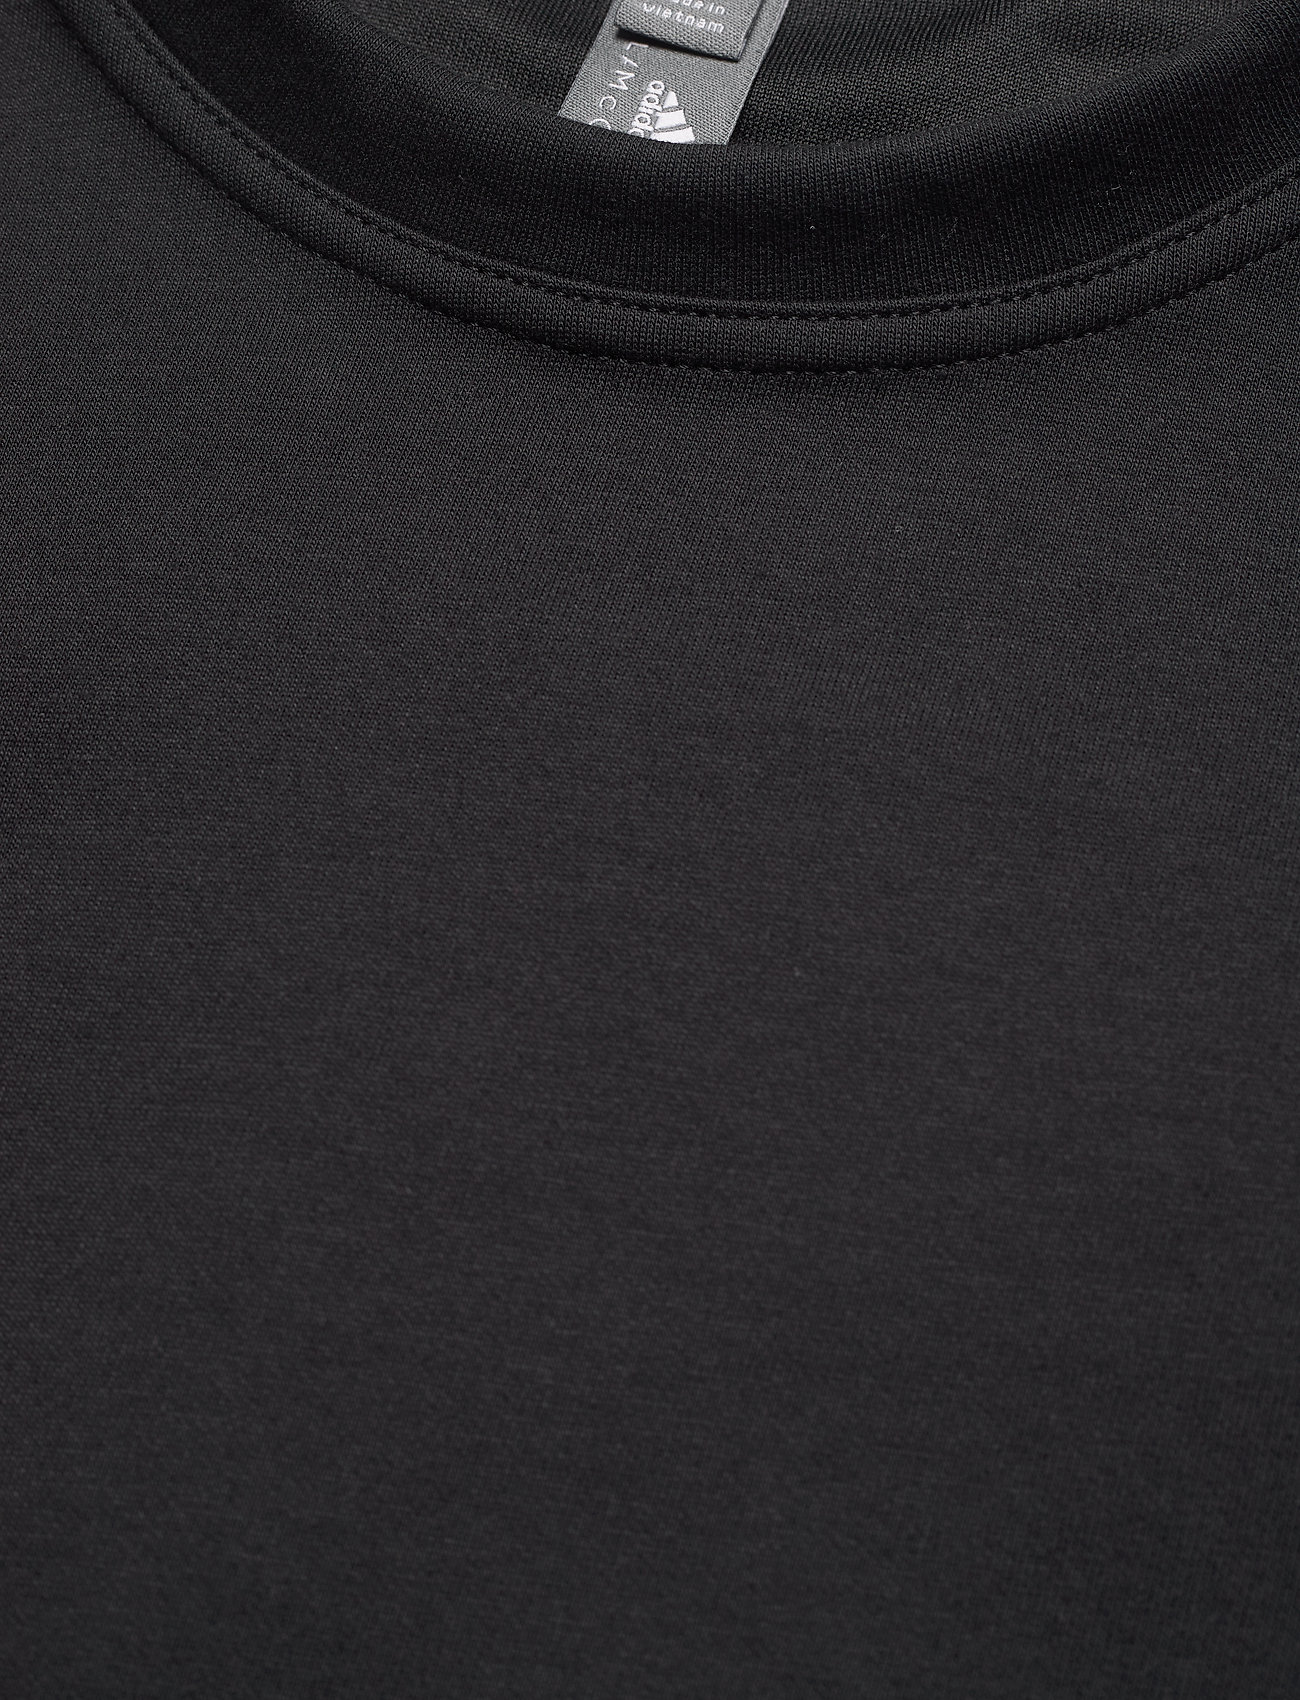 adidas by Stella McCartney - Future Playground Cropped T-Shirt W - tops & t-shirts - black - 6